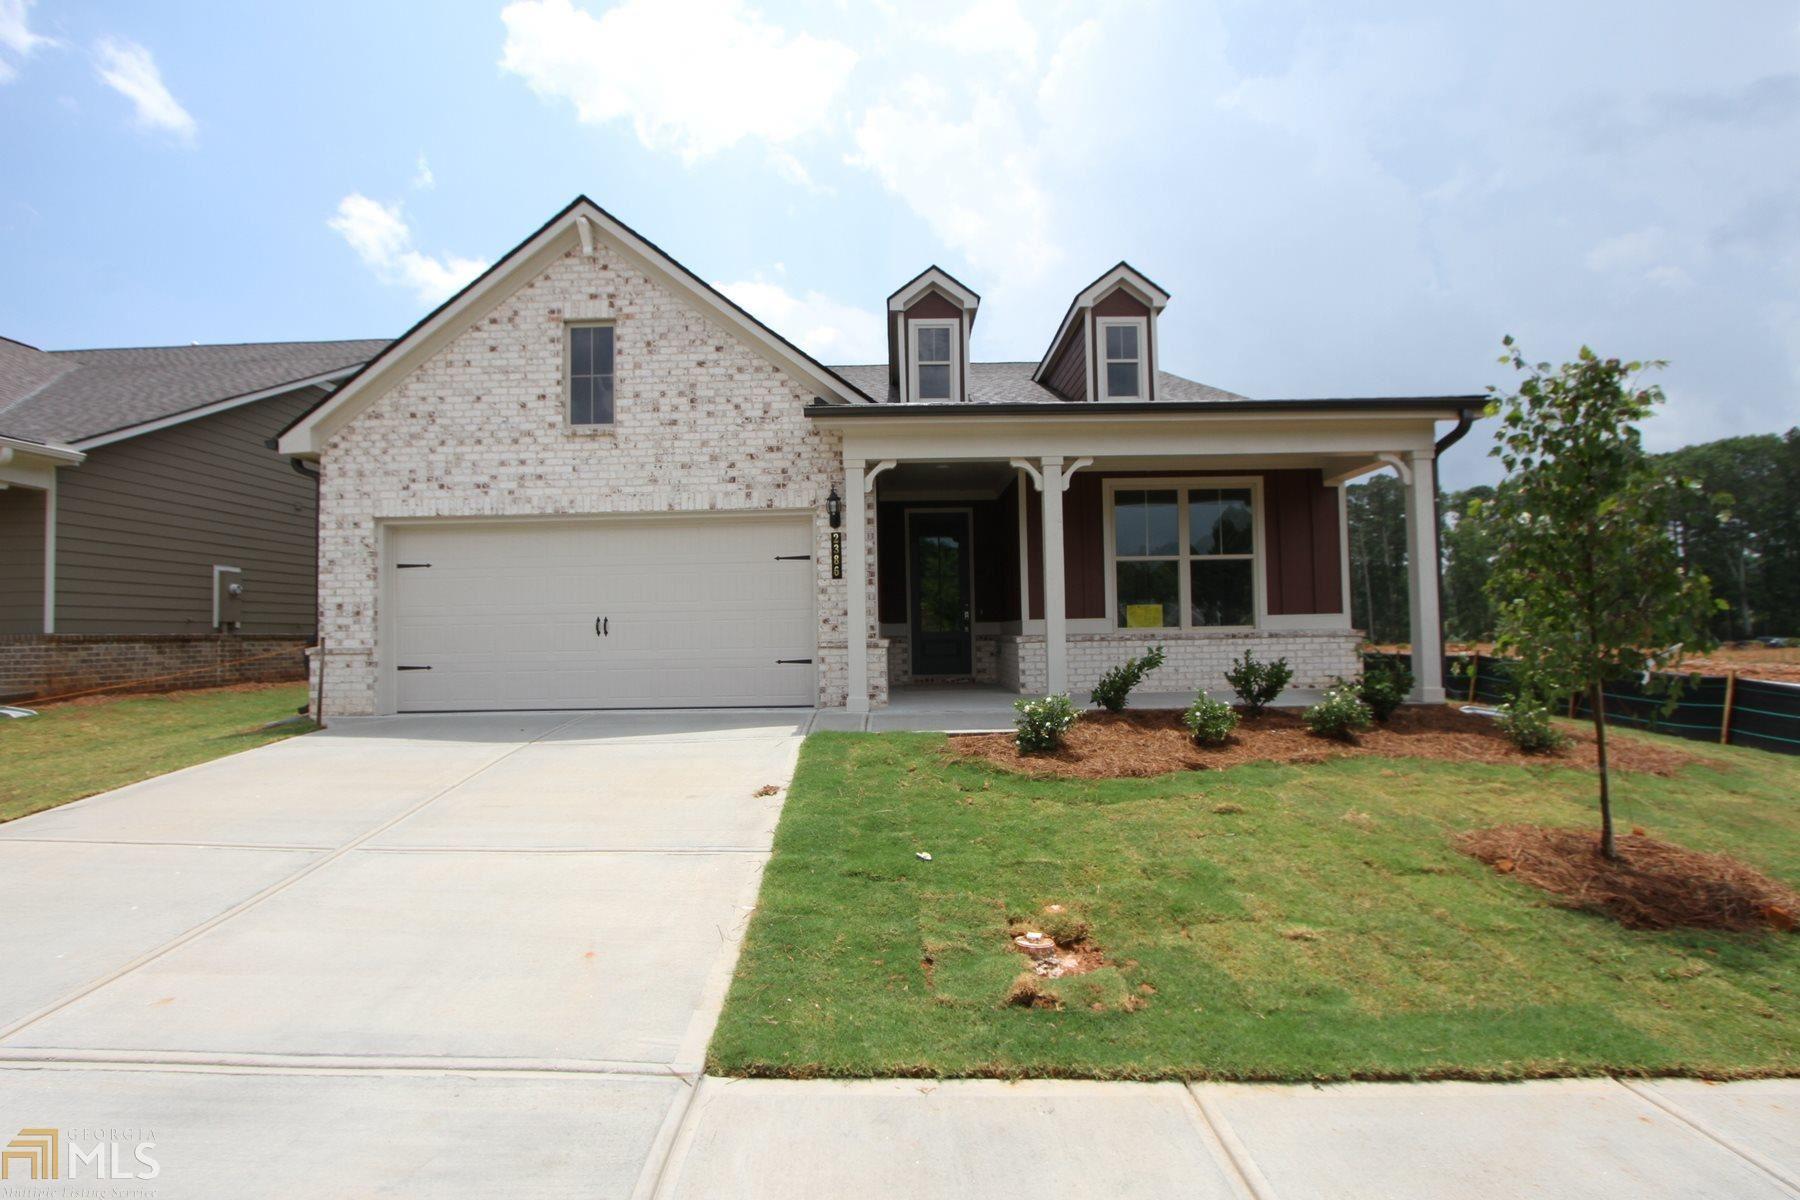 162 Rolling Hills Pl, Canton, GA 30114 - #: 8884215